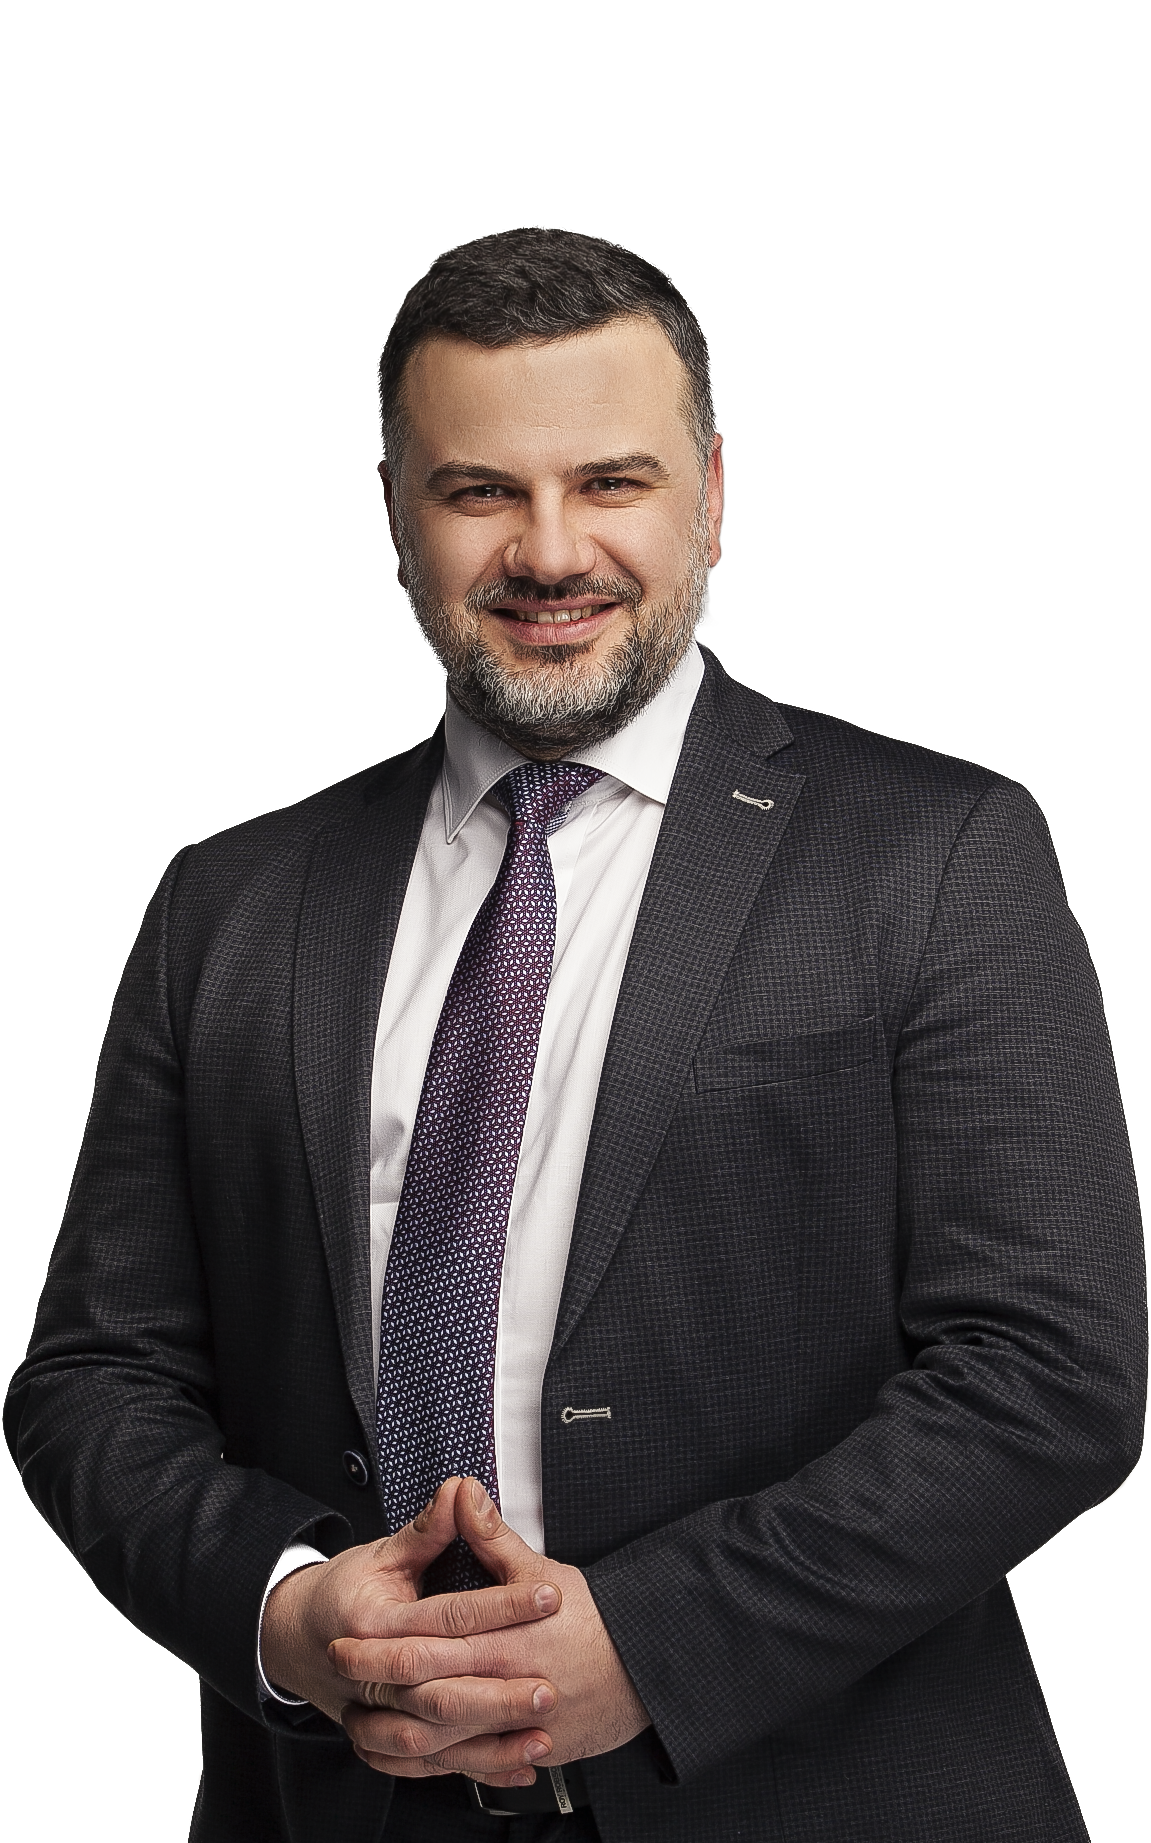 ip-interview-yaroslav-ognevyuk-denis-krokhmalyov-russian